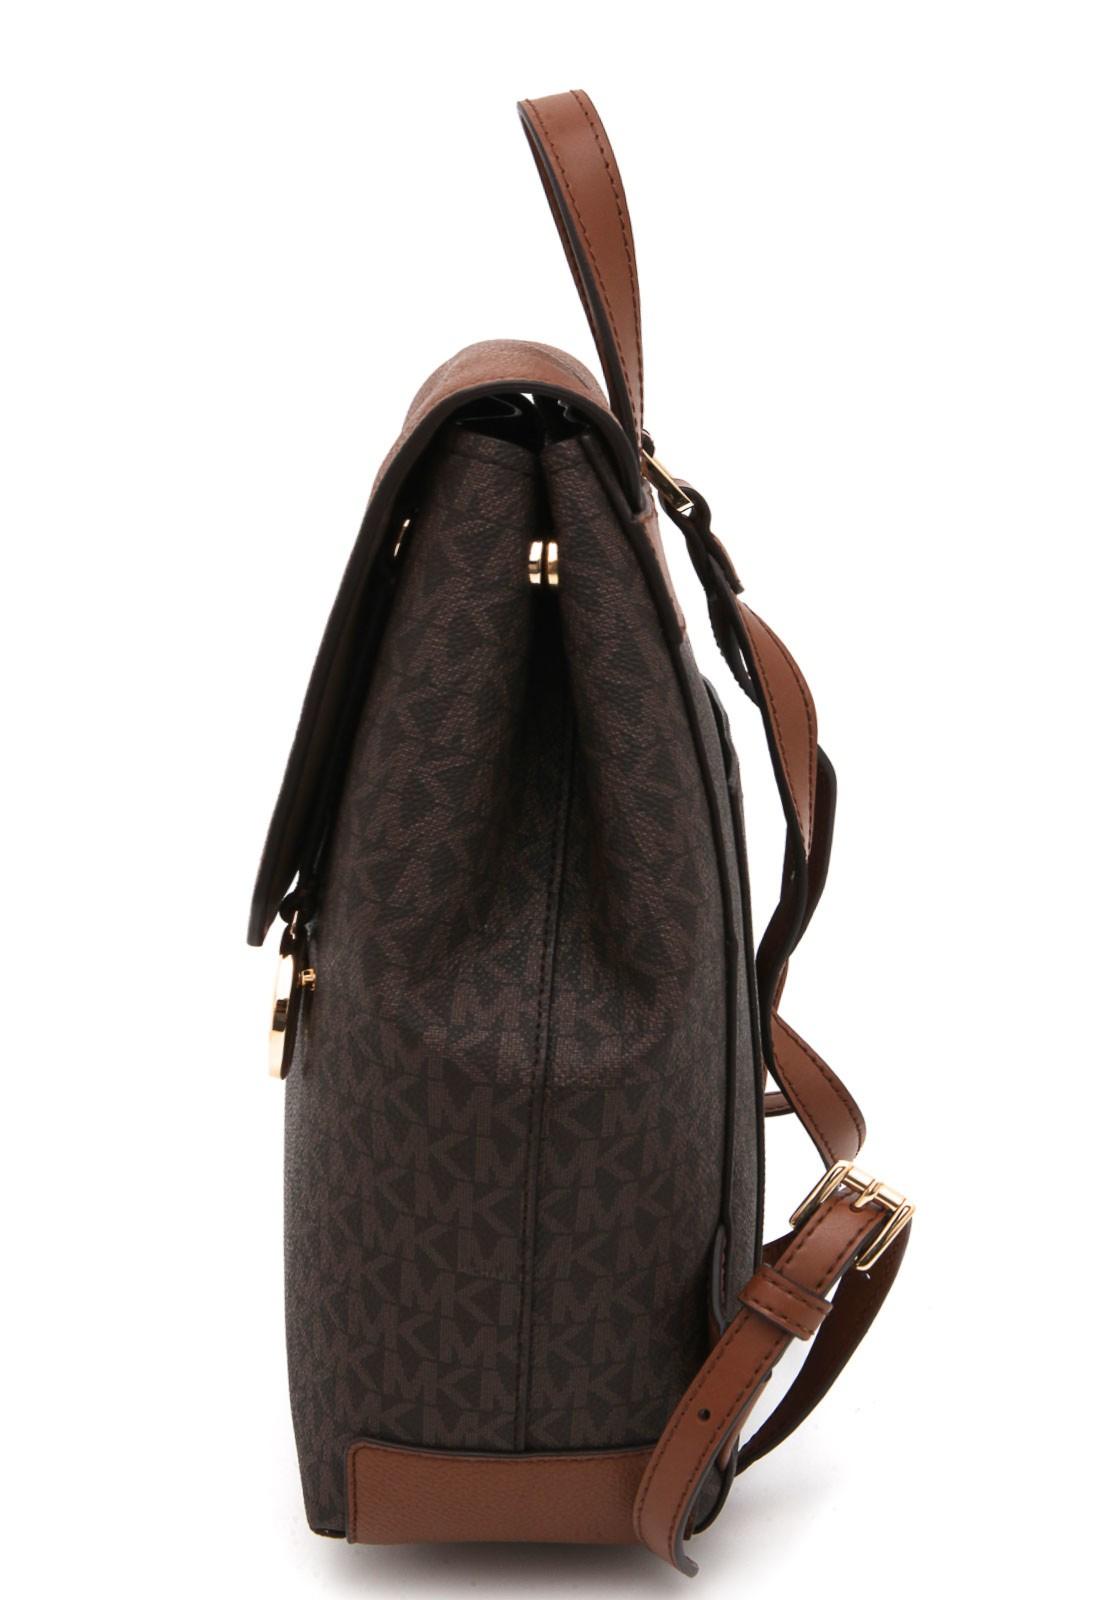 Mochila Michael Kors Hayes Marrom Luggage